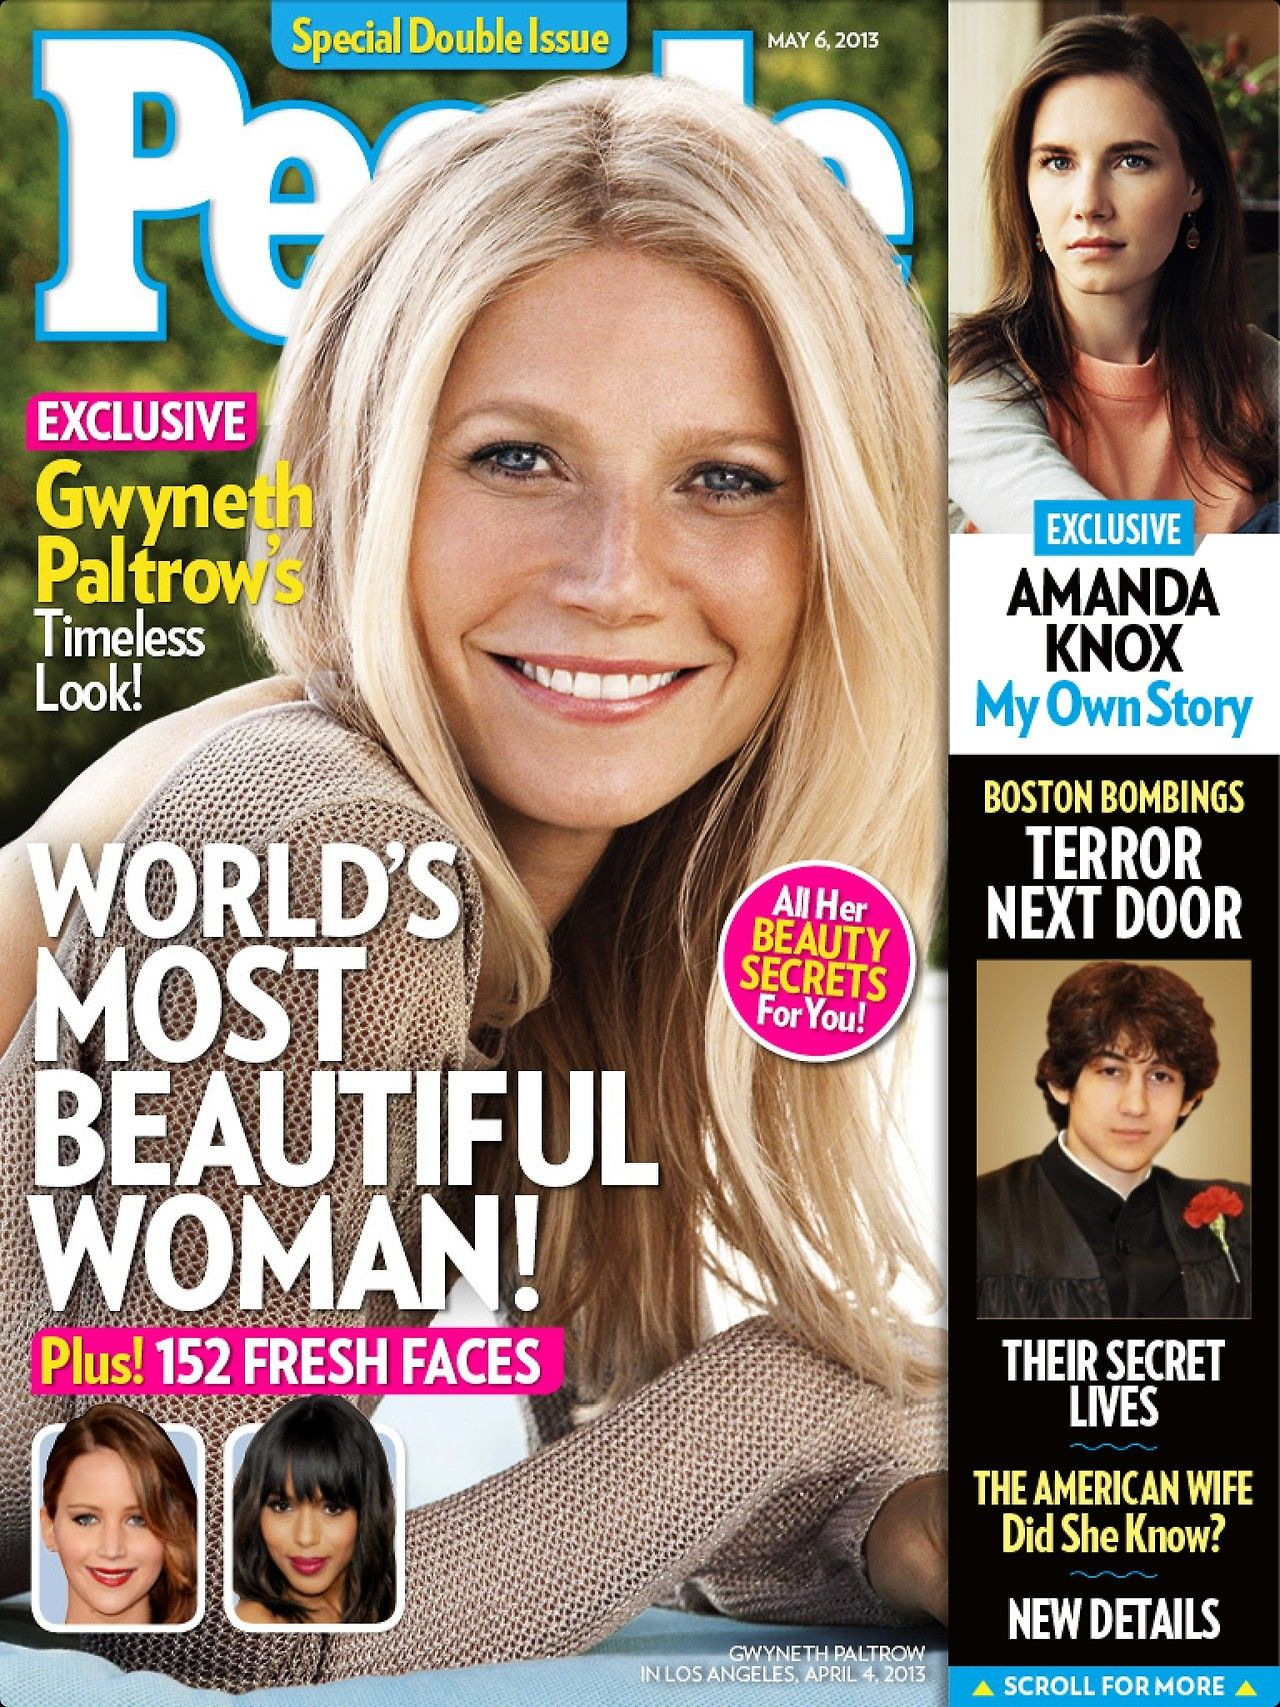 May 2013 Fashion Magazine Covers: People Magazine 2013 -04